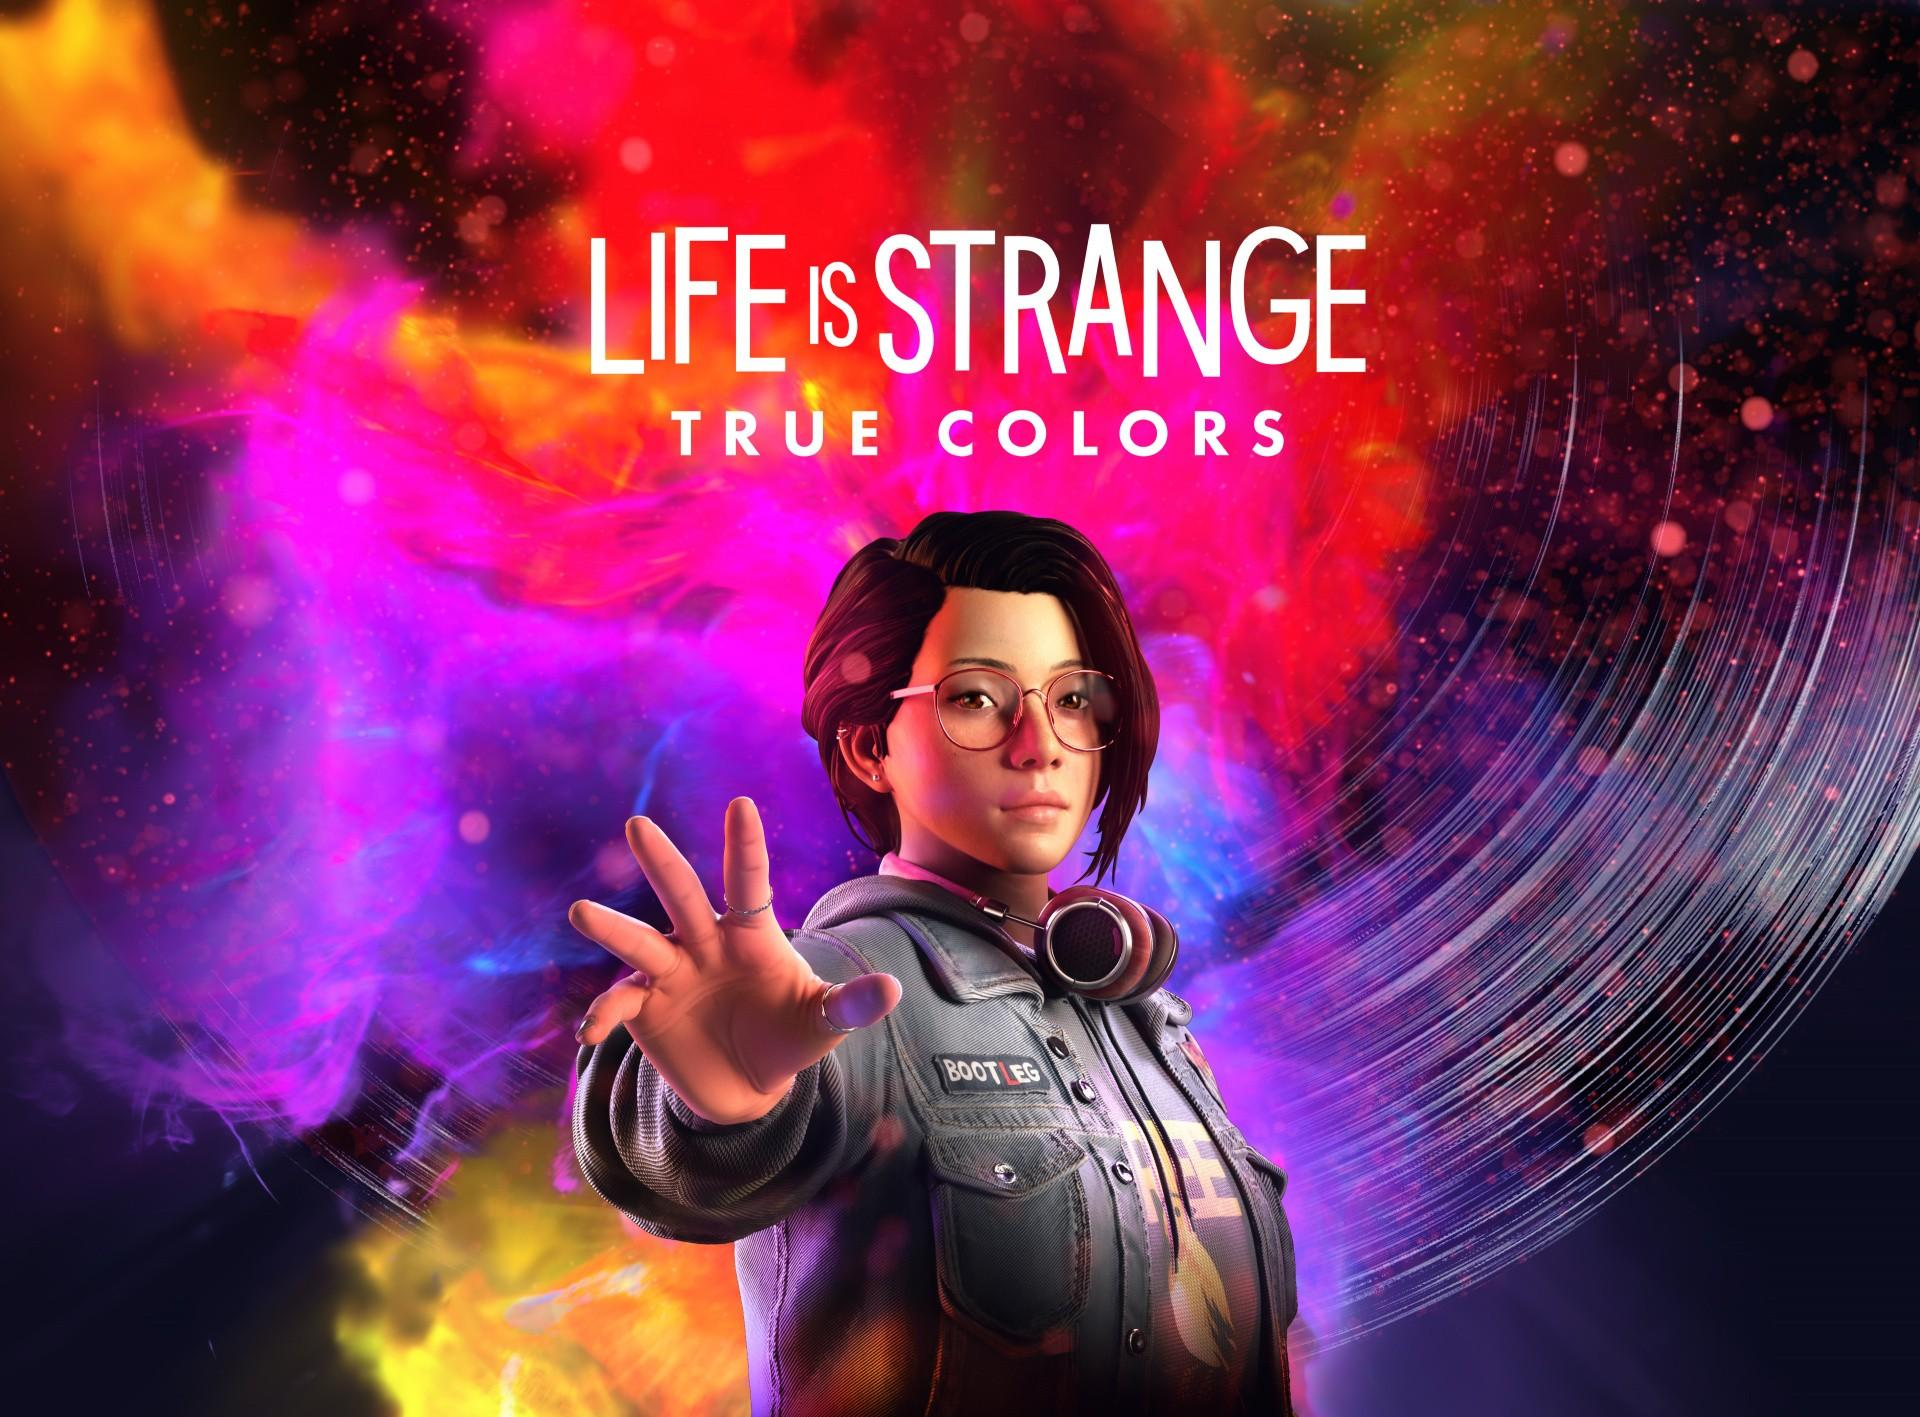 Life is Strange: True Colors выйдет в сентябре, а Life is Strange и Life is Strange: Before the Storm получат ремастер 2